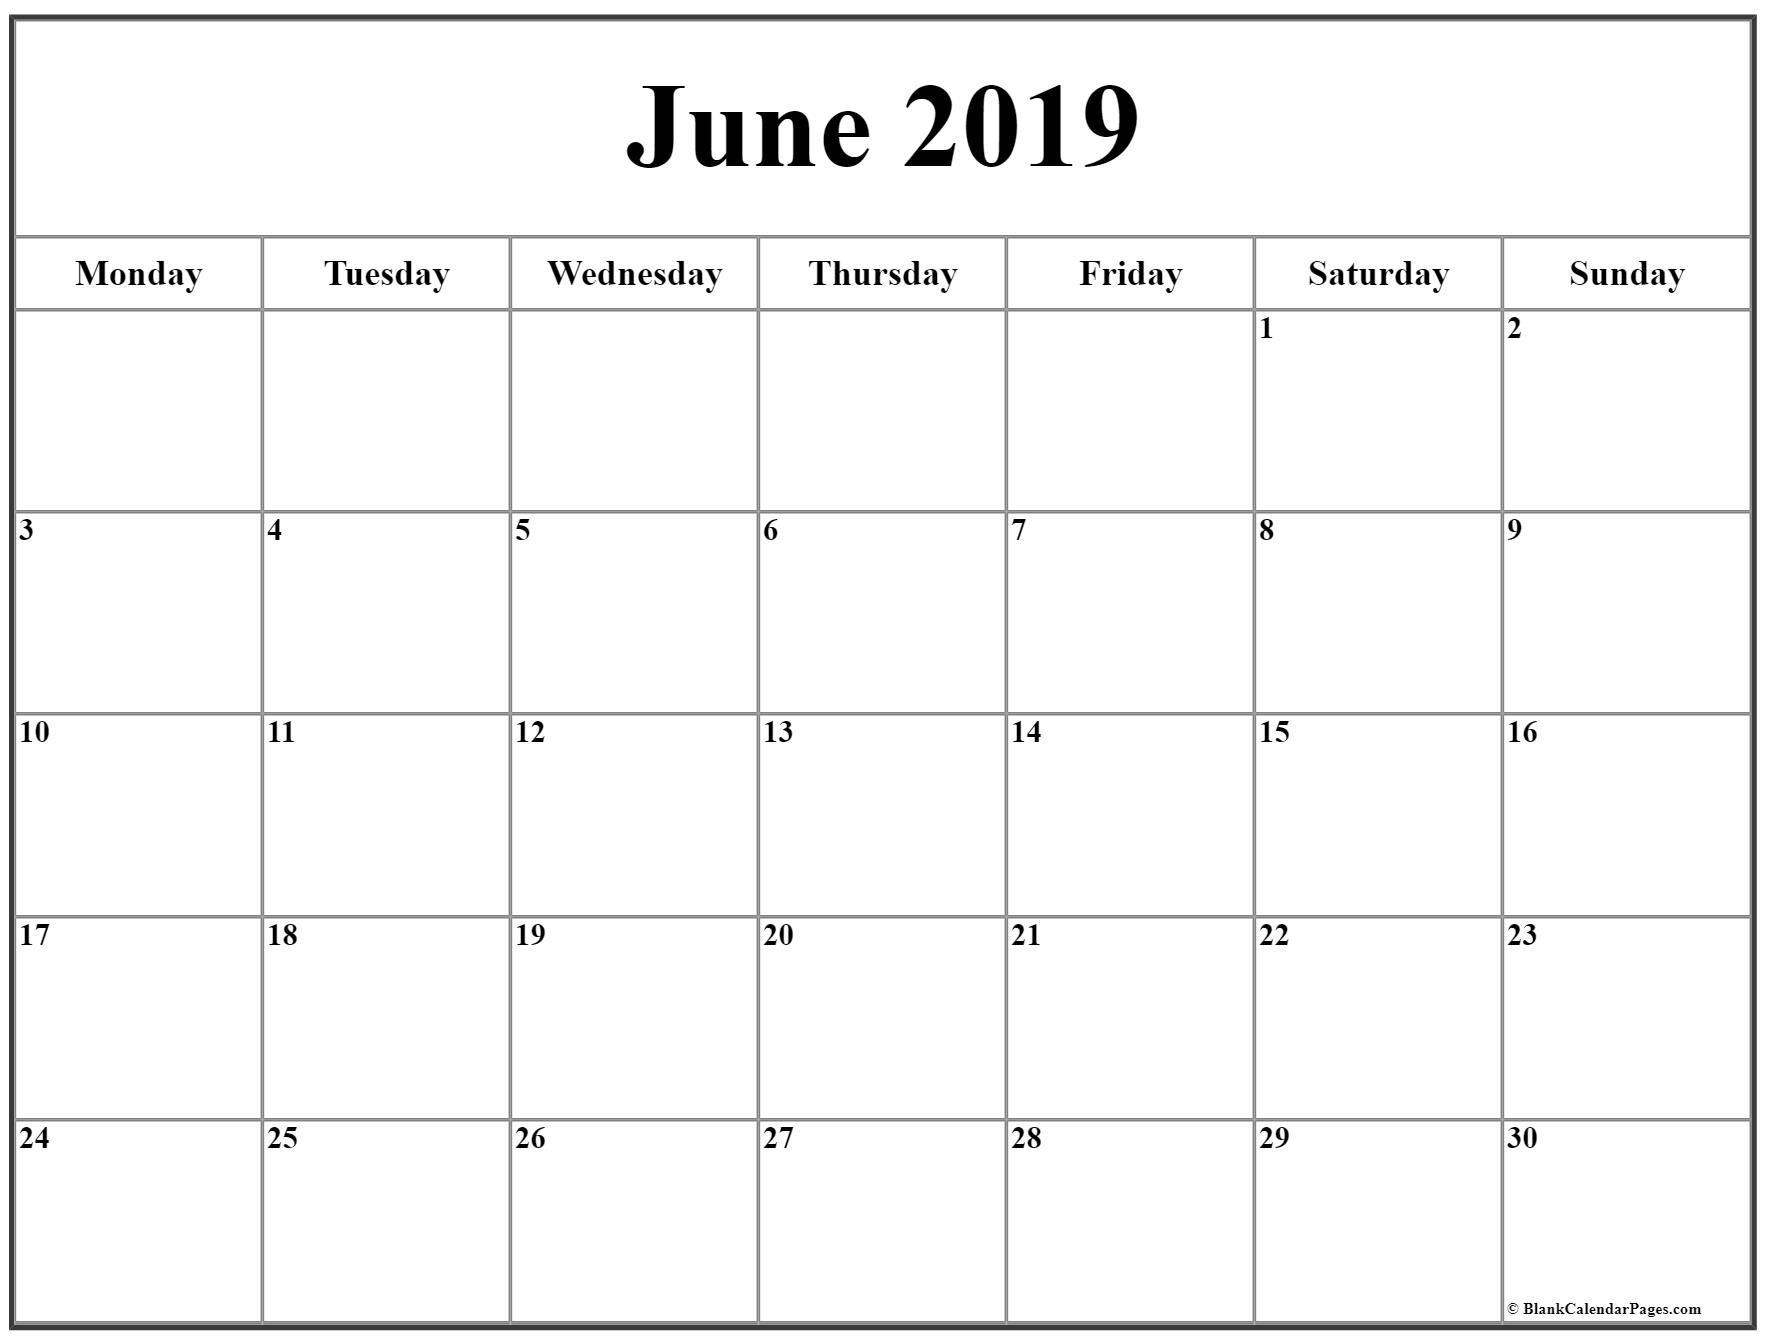 June 2019 Monday Calendar | Monday To Sunday